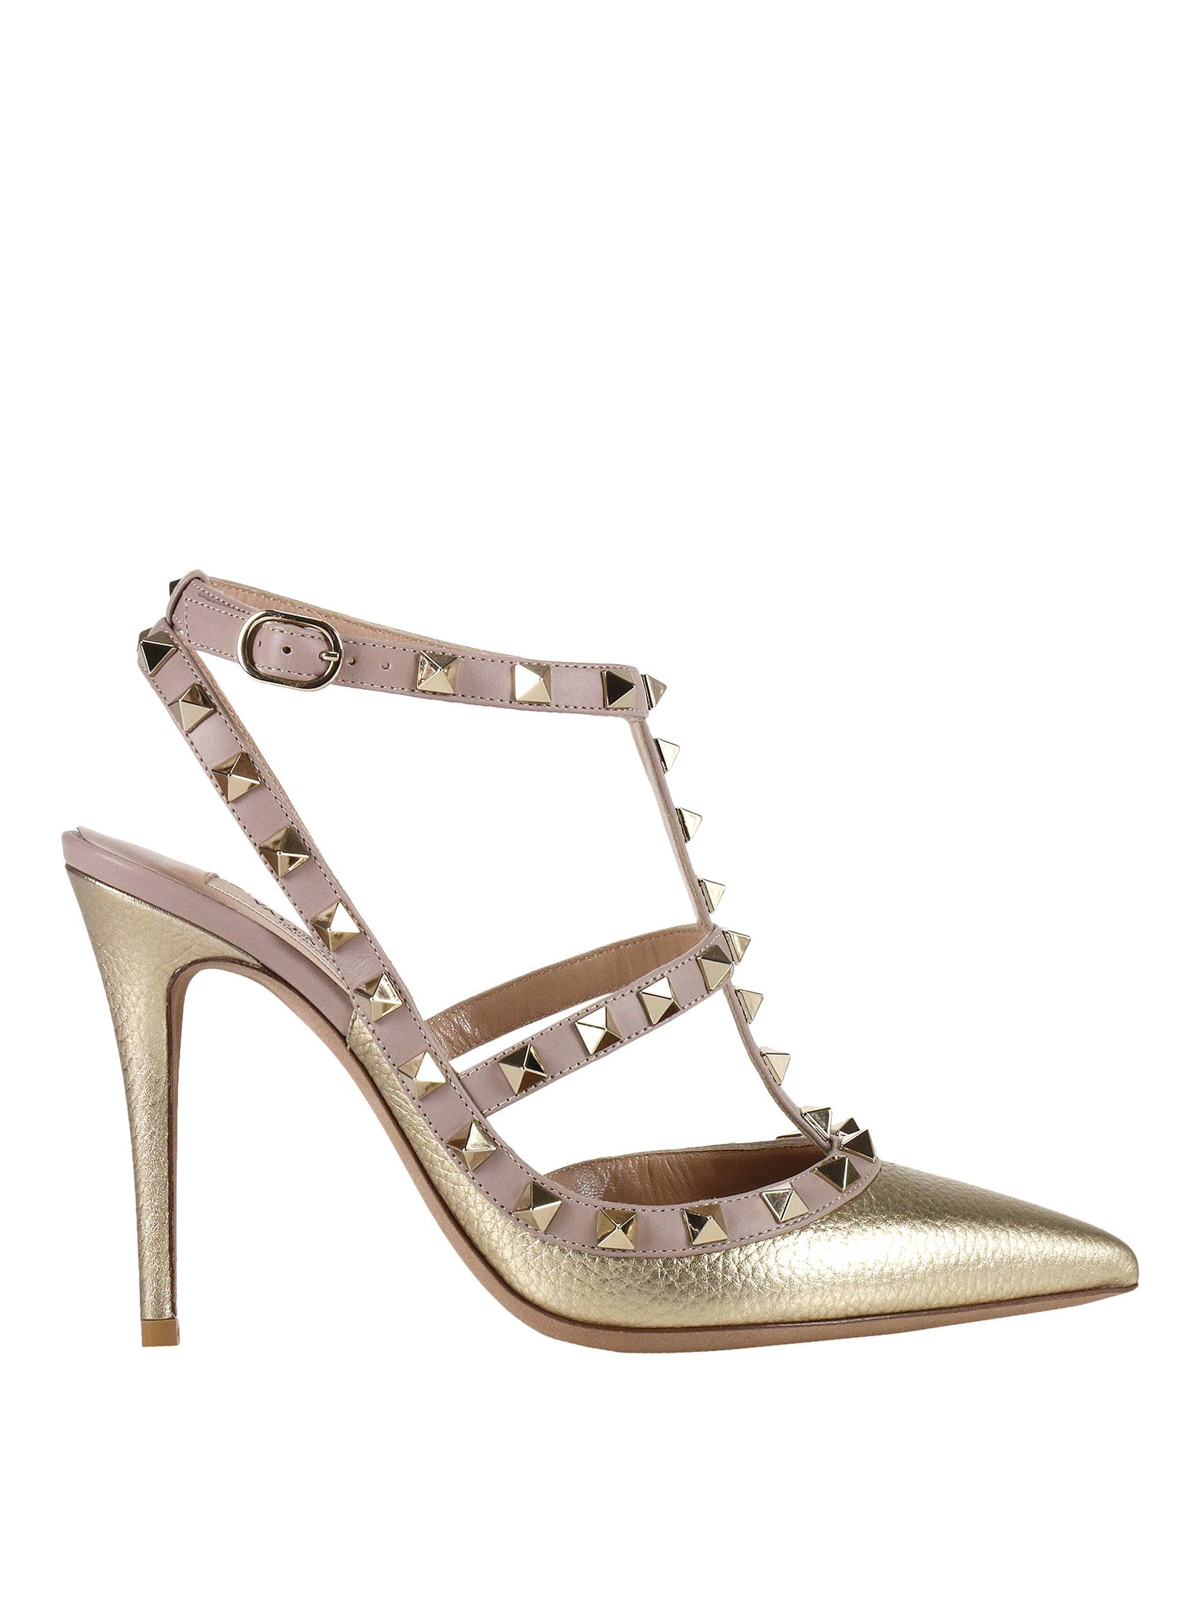 valentino garavani rockstud two tone slingback pumps court shoes nw2s0393viw39n. Black Bedroom Furniture Sets. Home Design Ideas